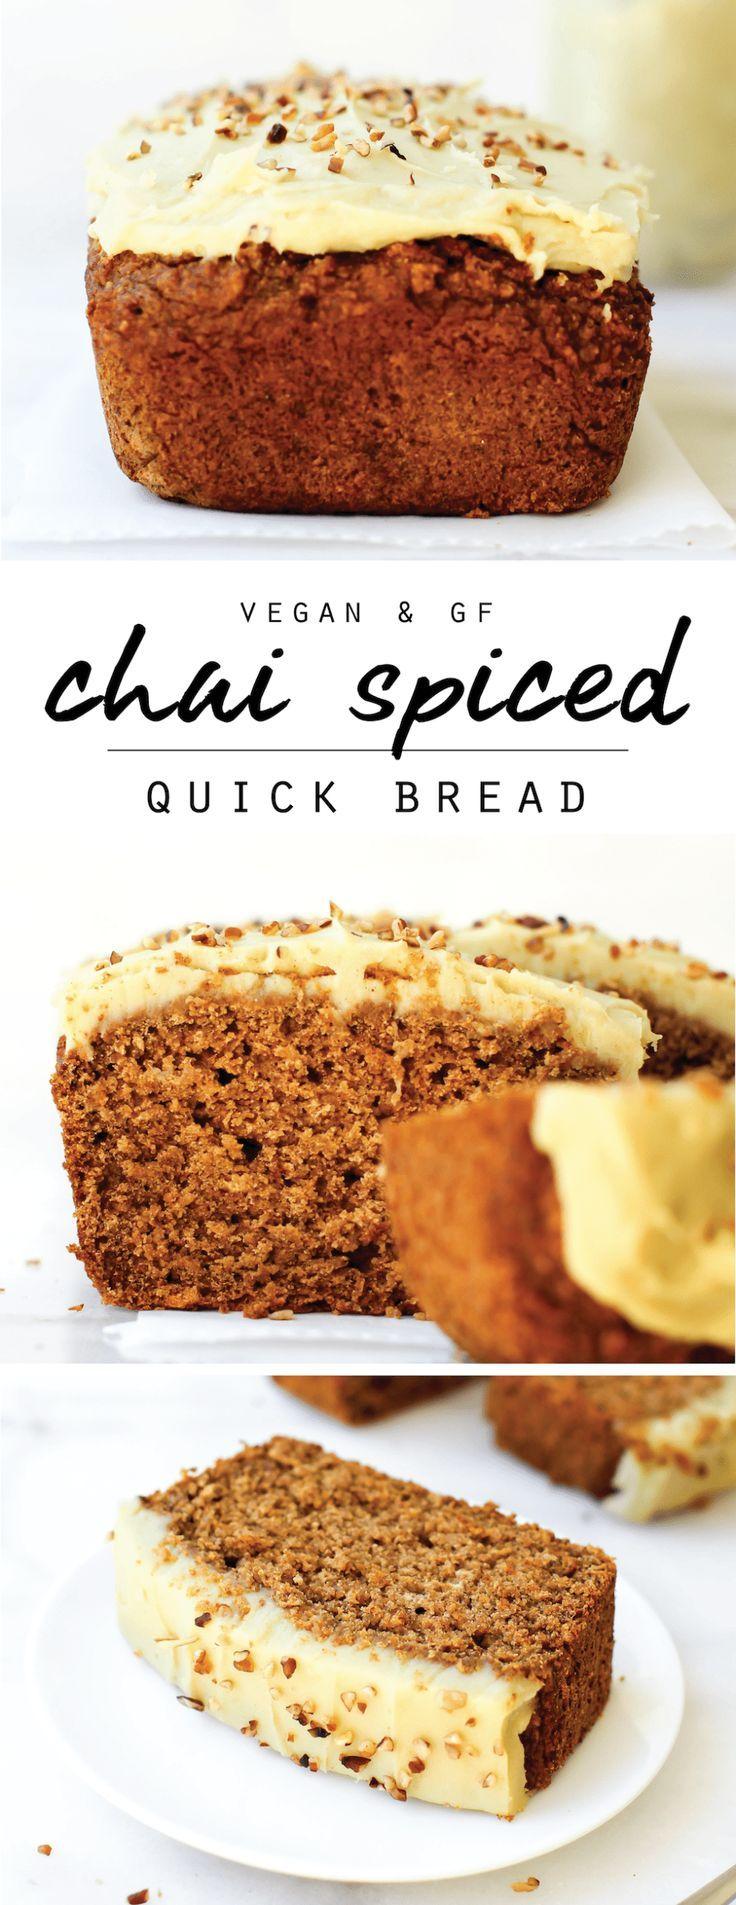 Chai Spiced Quick Bread Vegan Gluten Free Oil Free Recipe Vegan Sweets Gluten Free Desserts Dessert Recipes